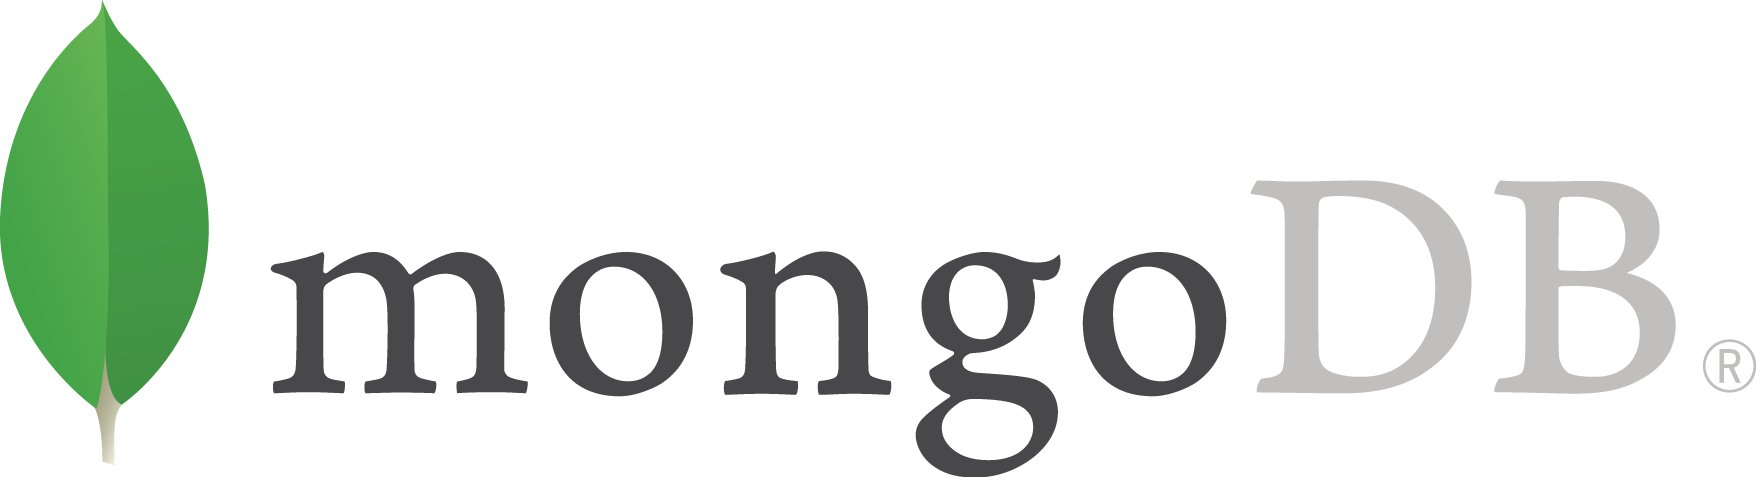 Base de datos MongoDB